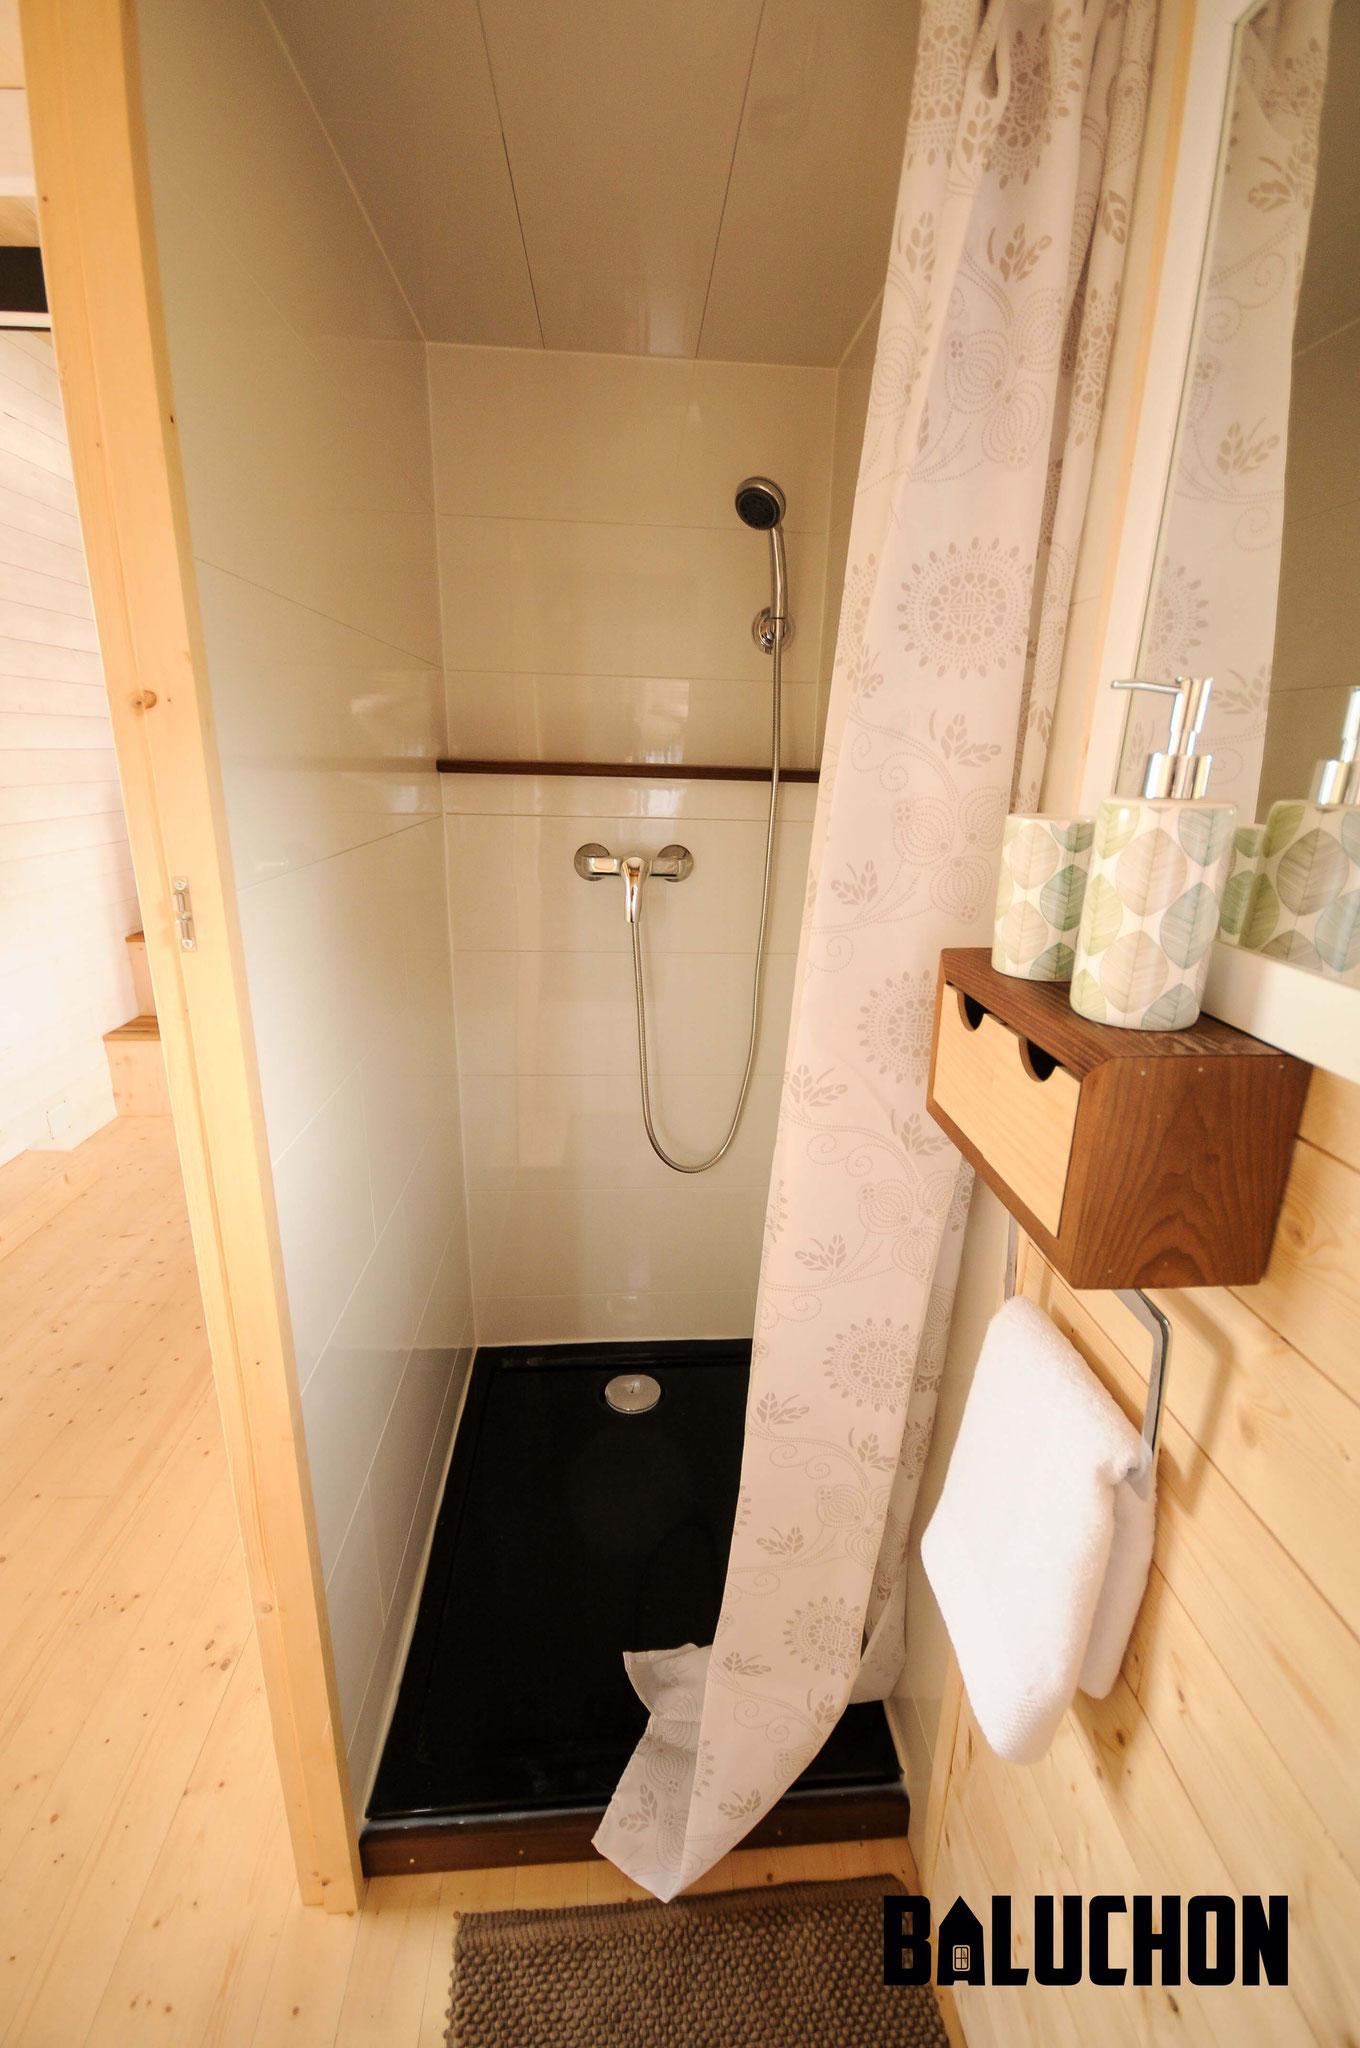 L'Odyssée - French Tiny House - Bathroom